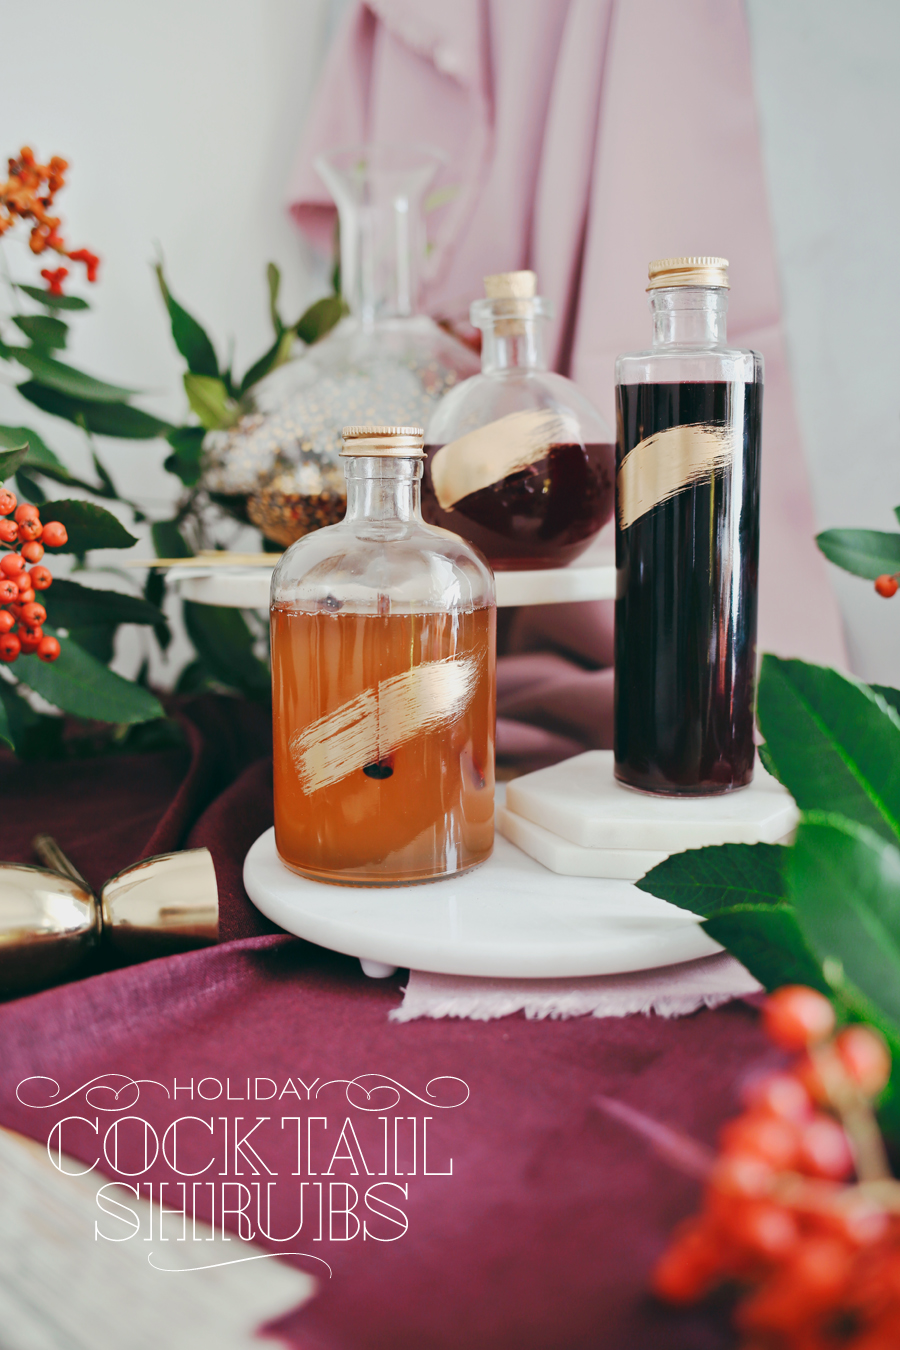 01_Holiday-Cocktail-Shurbs-Dine-X-Design.jpg